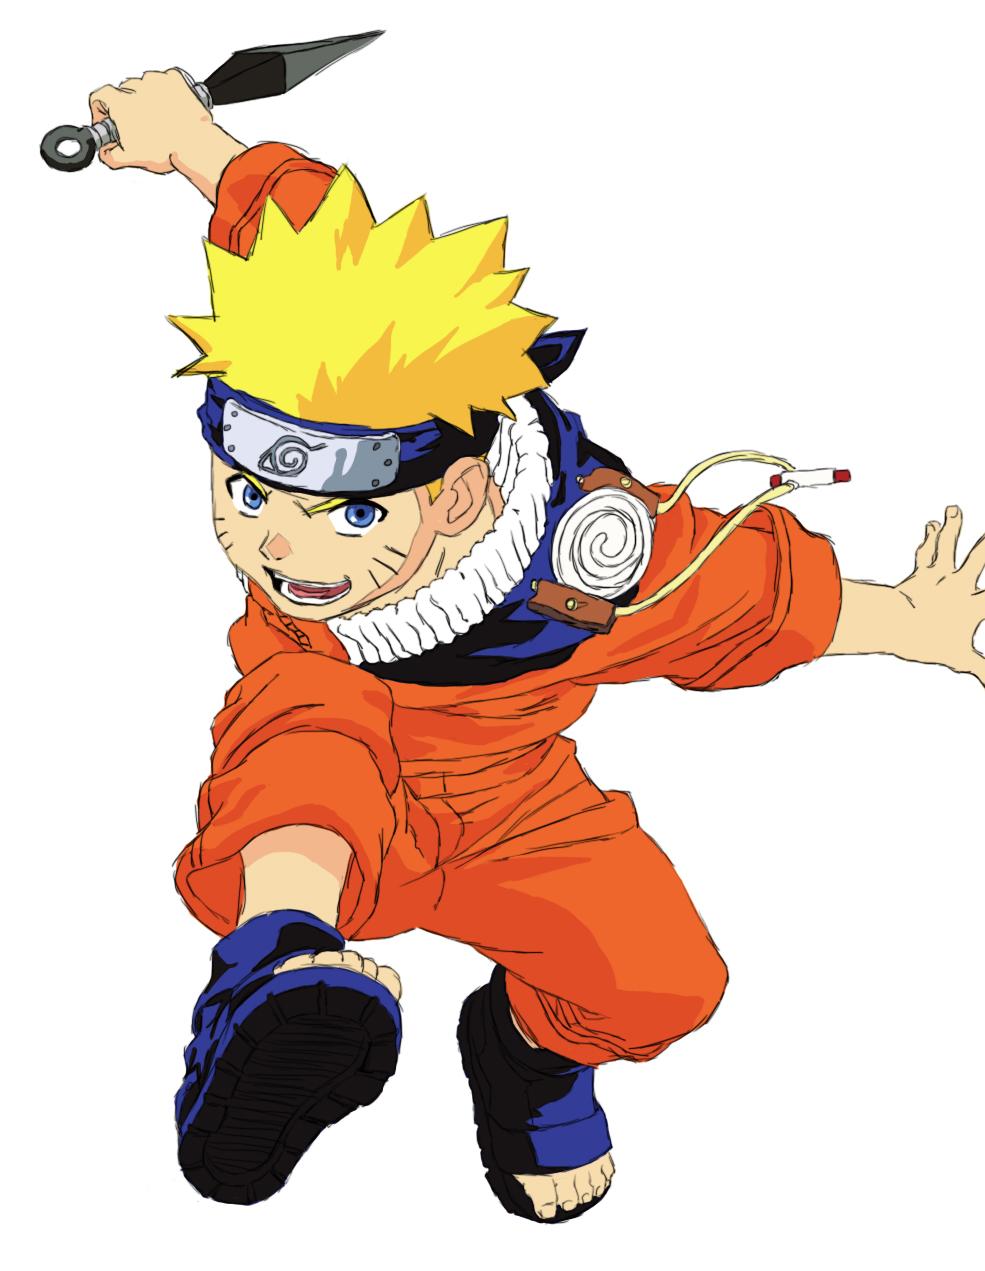 Kid Naruto by morganjent4 on DeviantArt